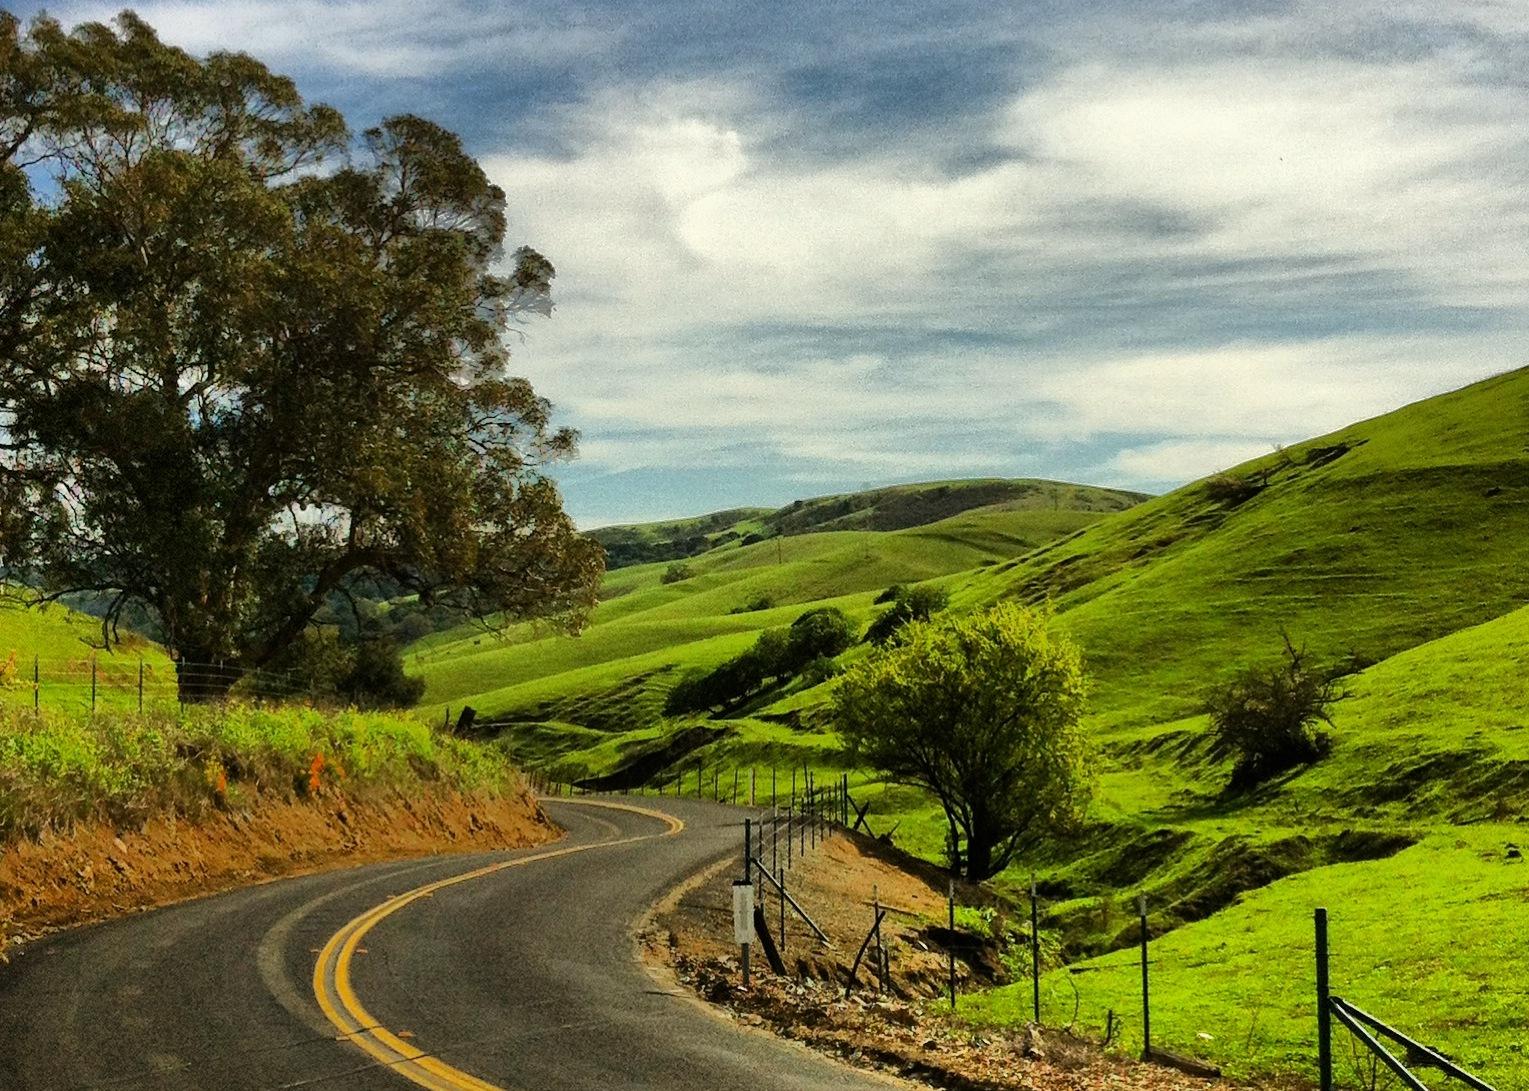 McEwen Road the easy way. (Downhill.)